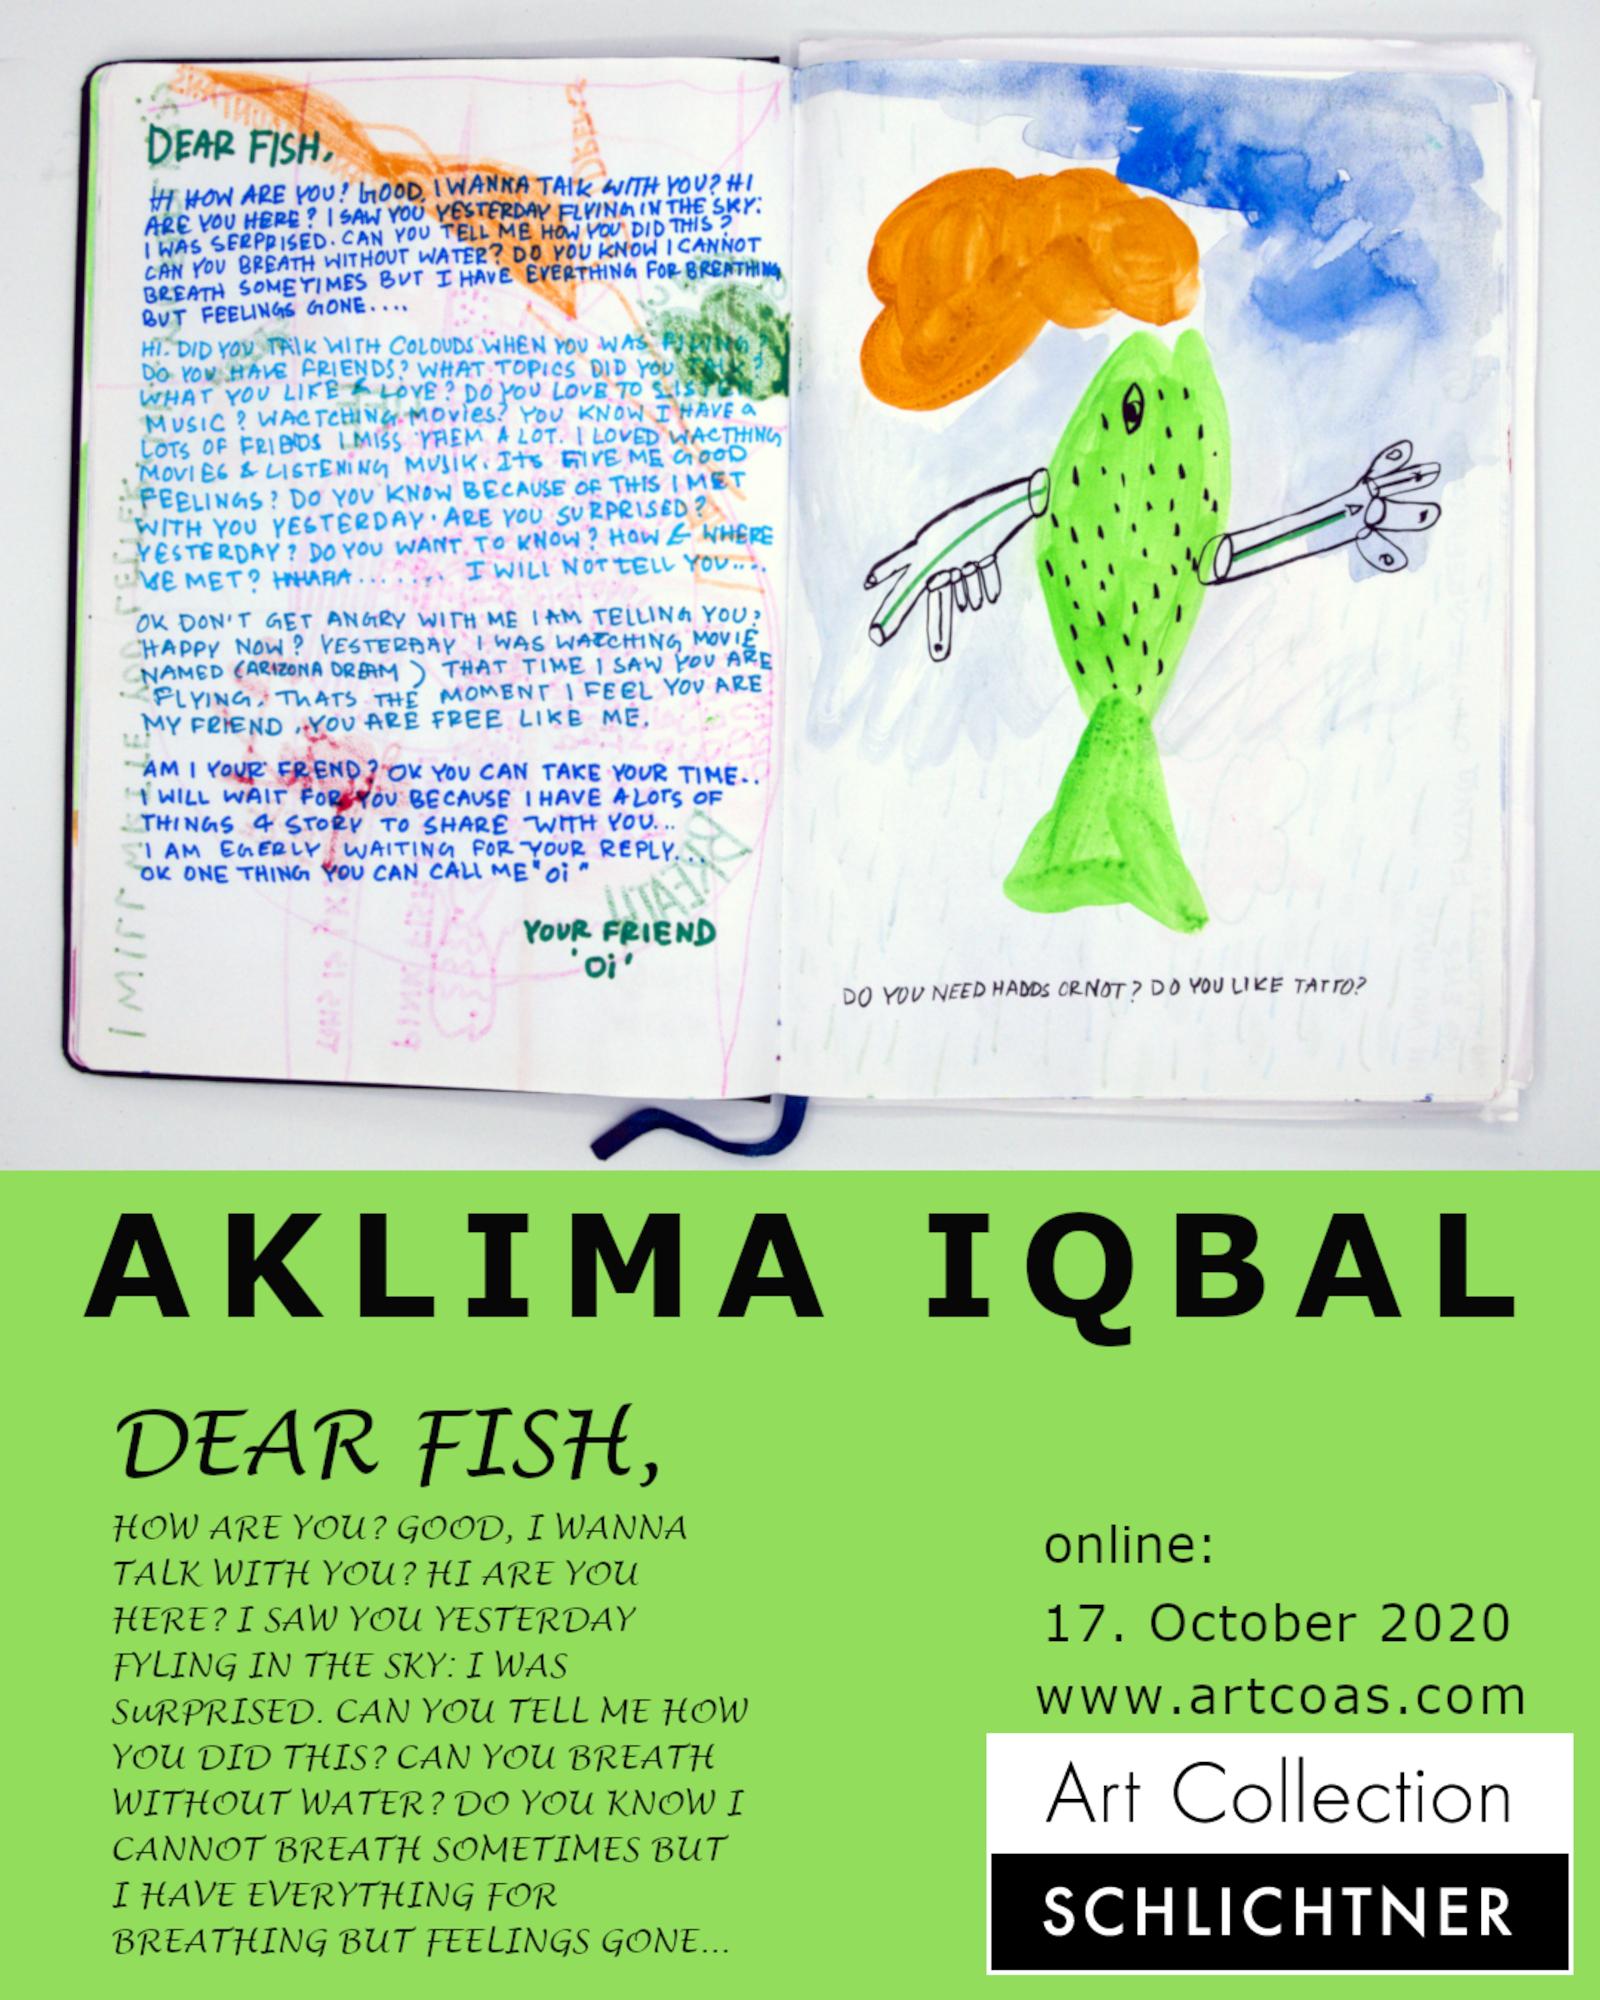 Aklima Iqbal